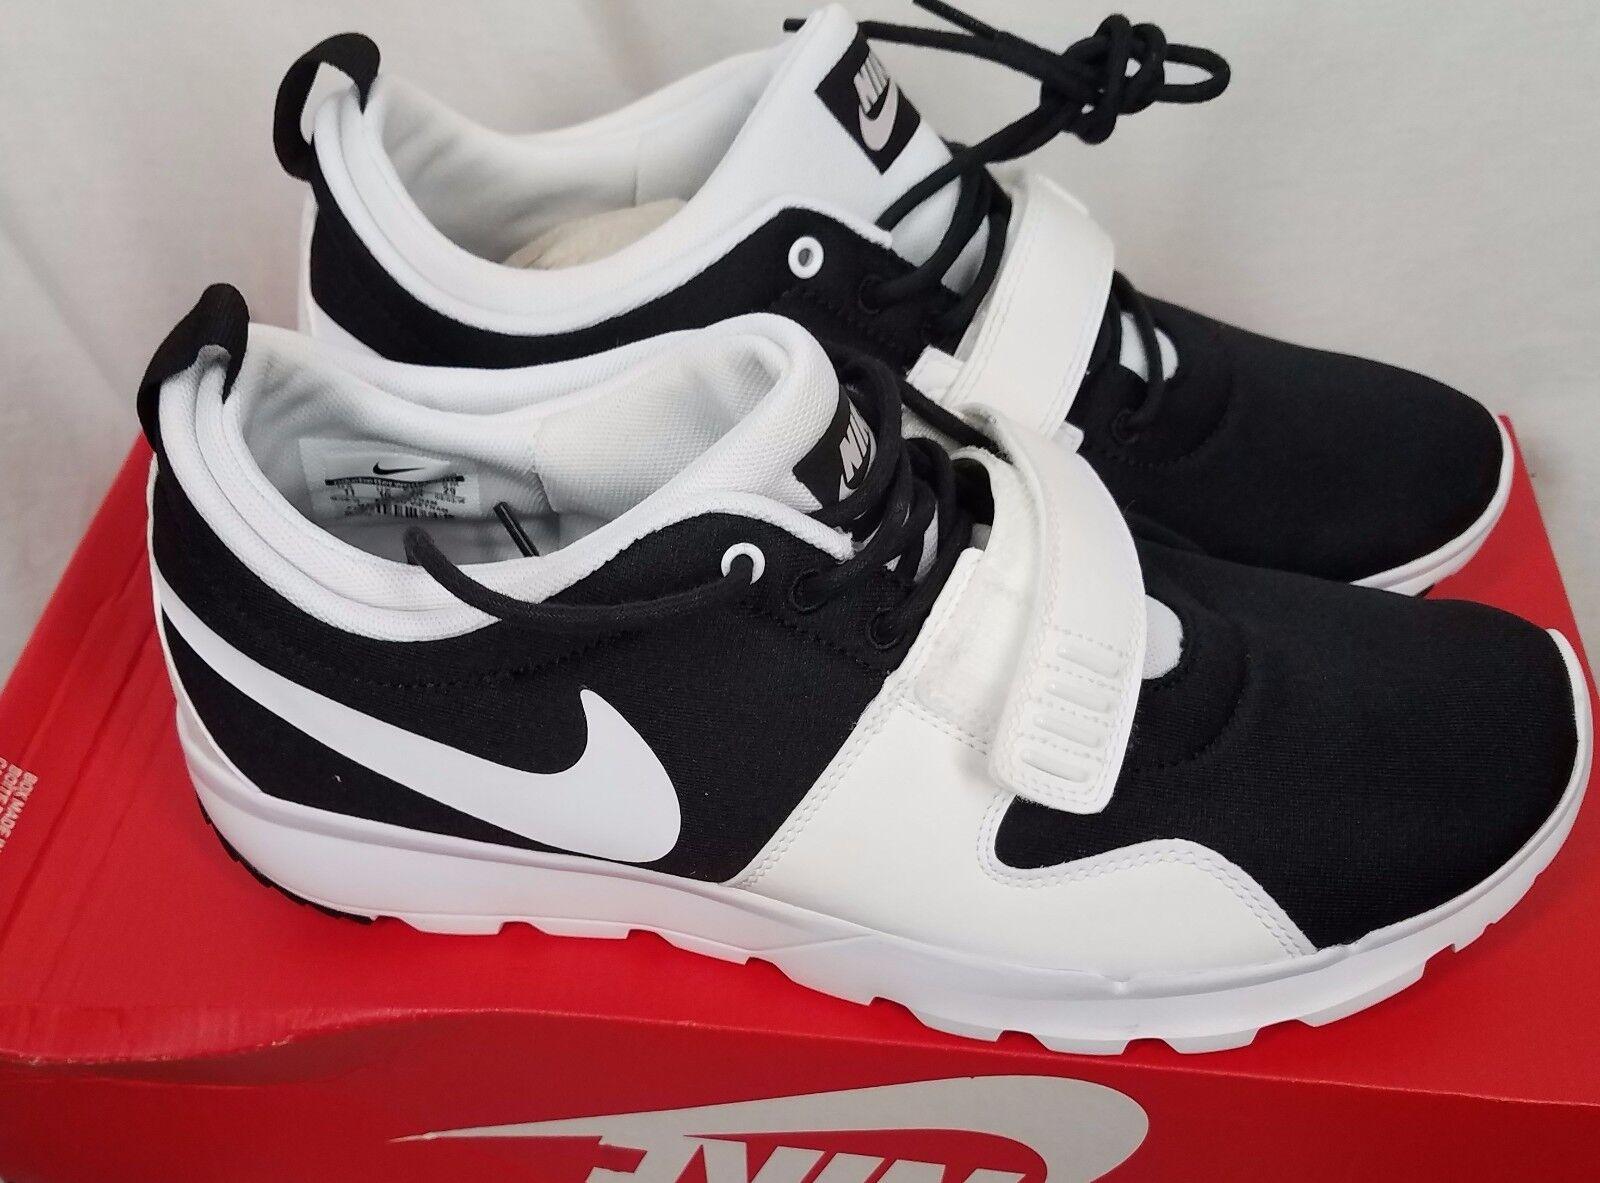 Nike Trainerendor SB ACG black white tennis shoes mens size 11.5 sneakers